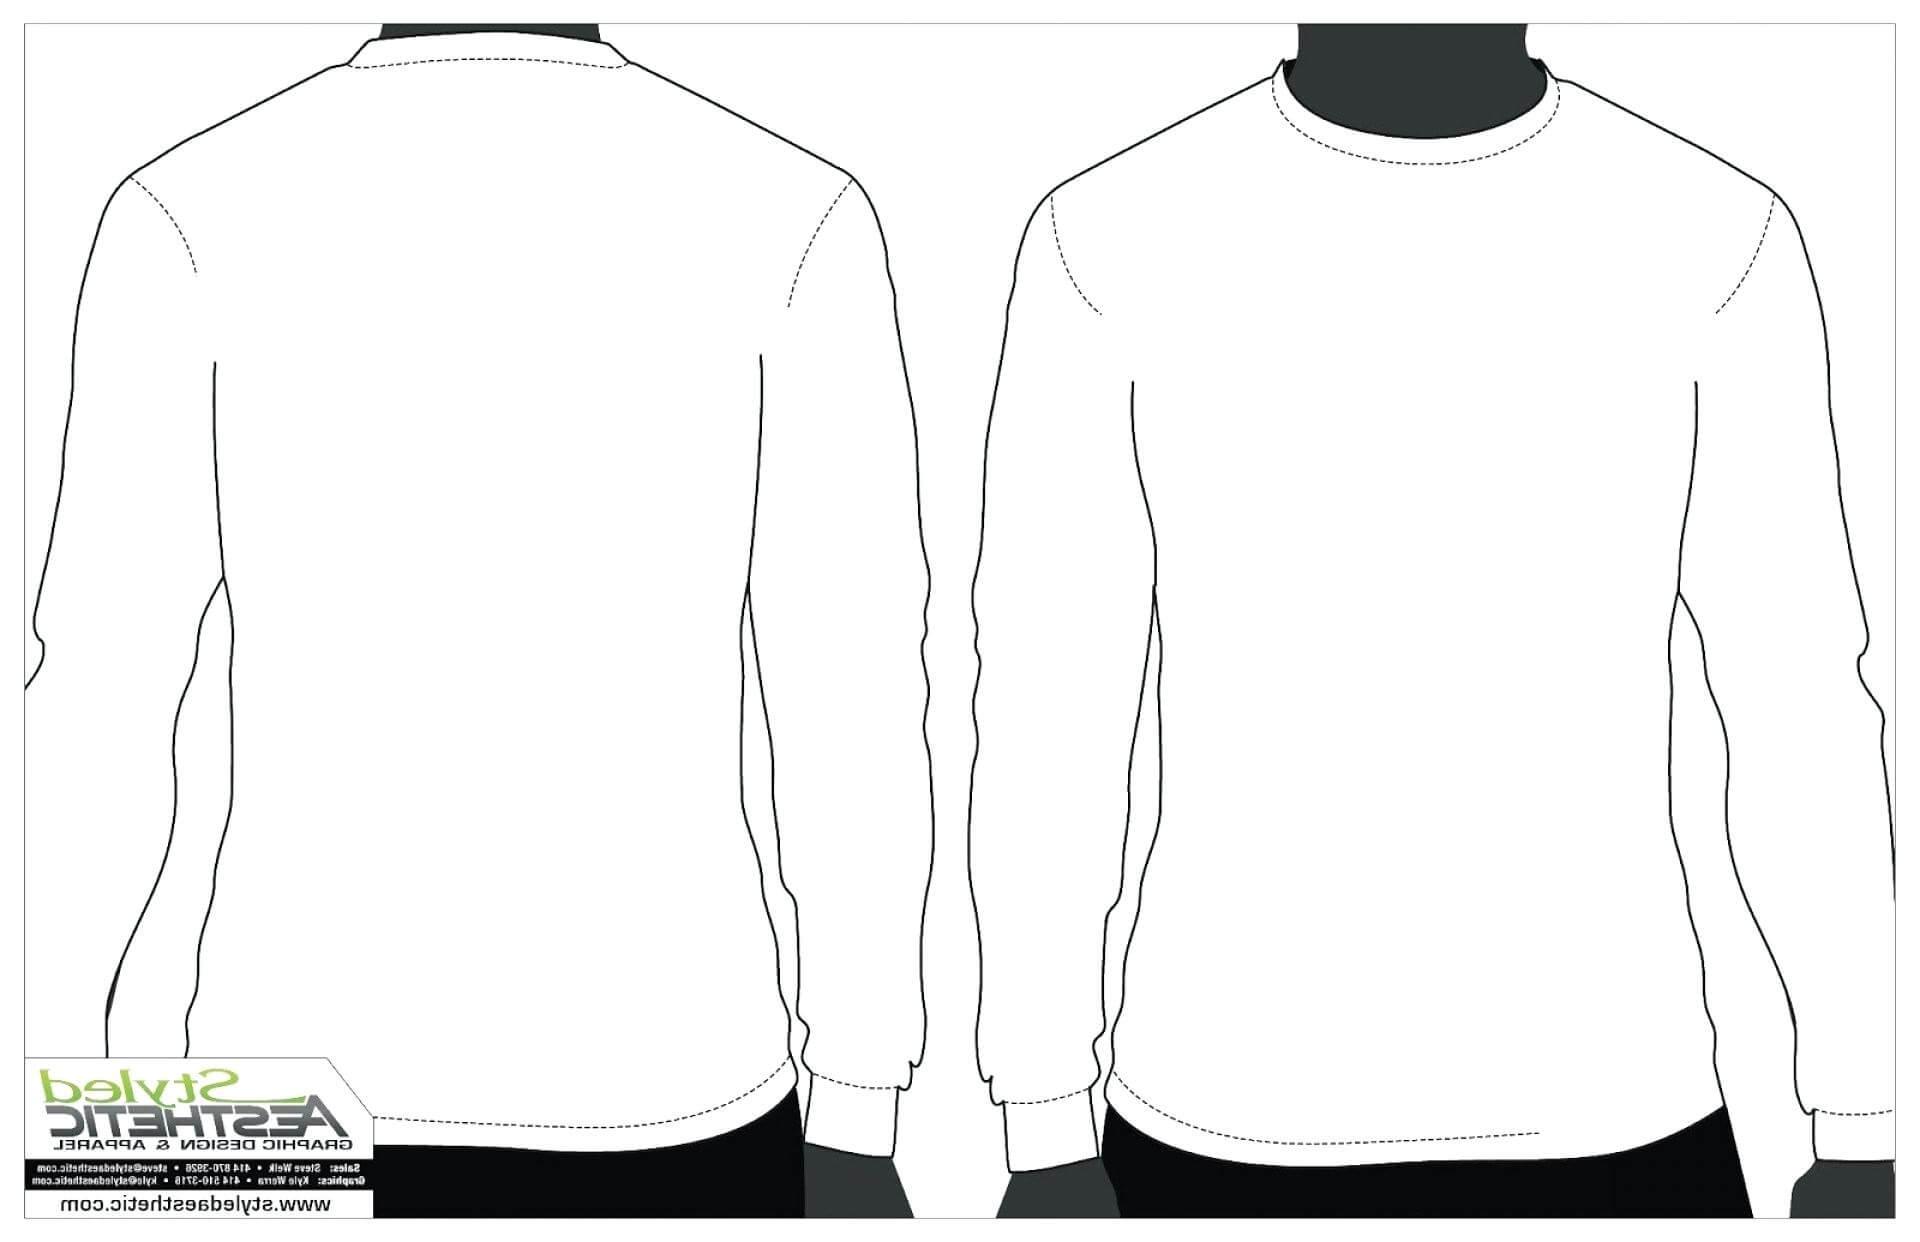 Template: Blank Vector Tee Shirts T Shirt Template Printable in Blank Tshirt Template Printable